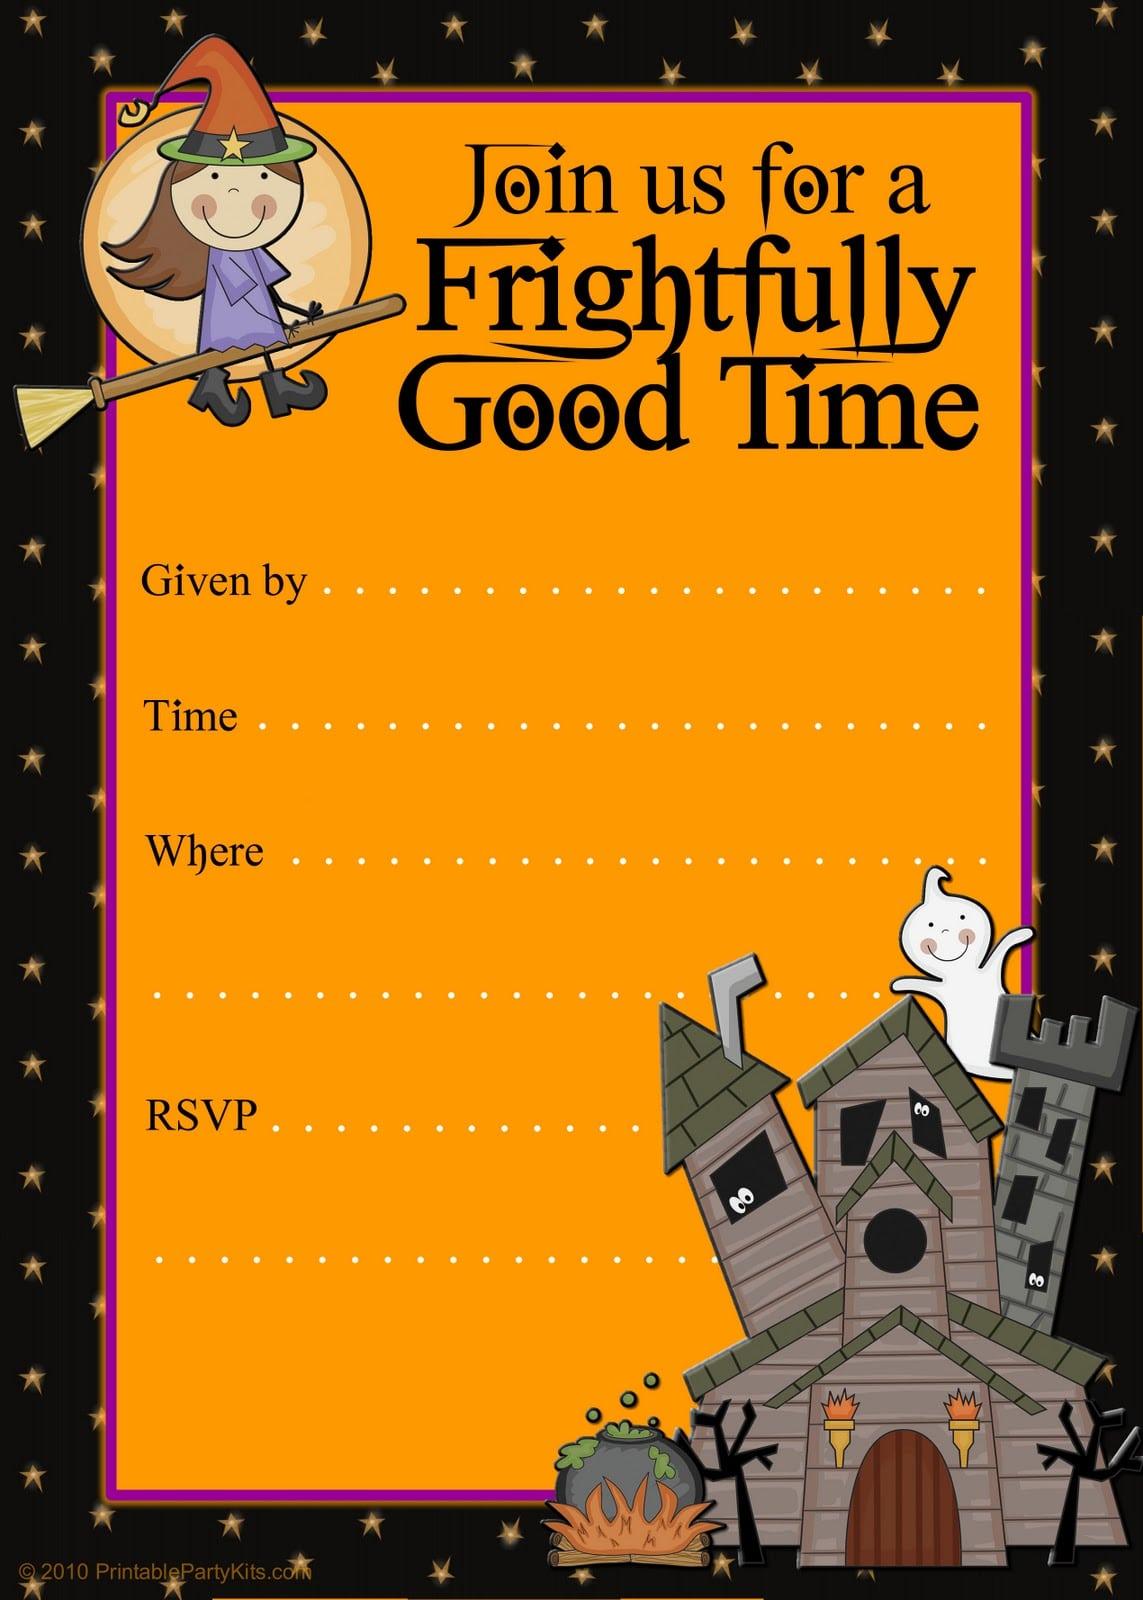 Printable Halloween Party Invitations Templates